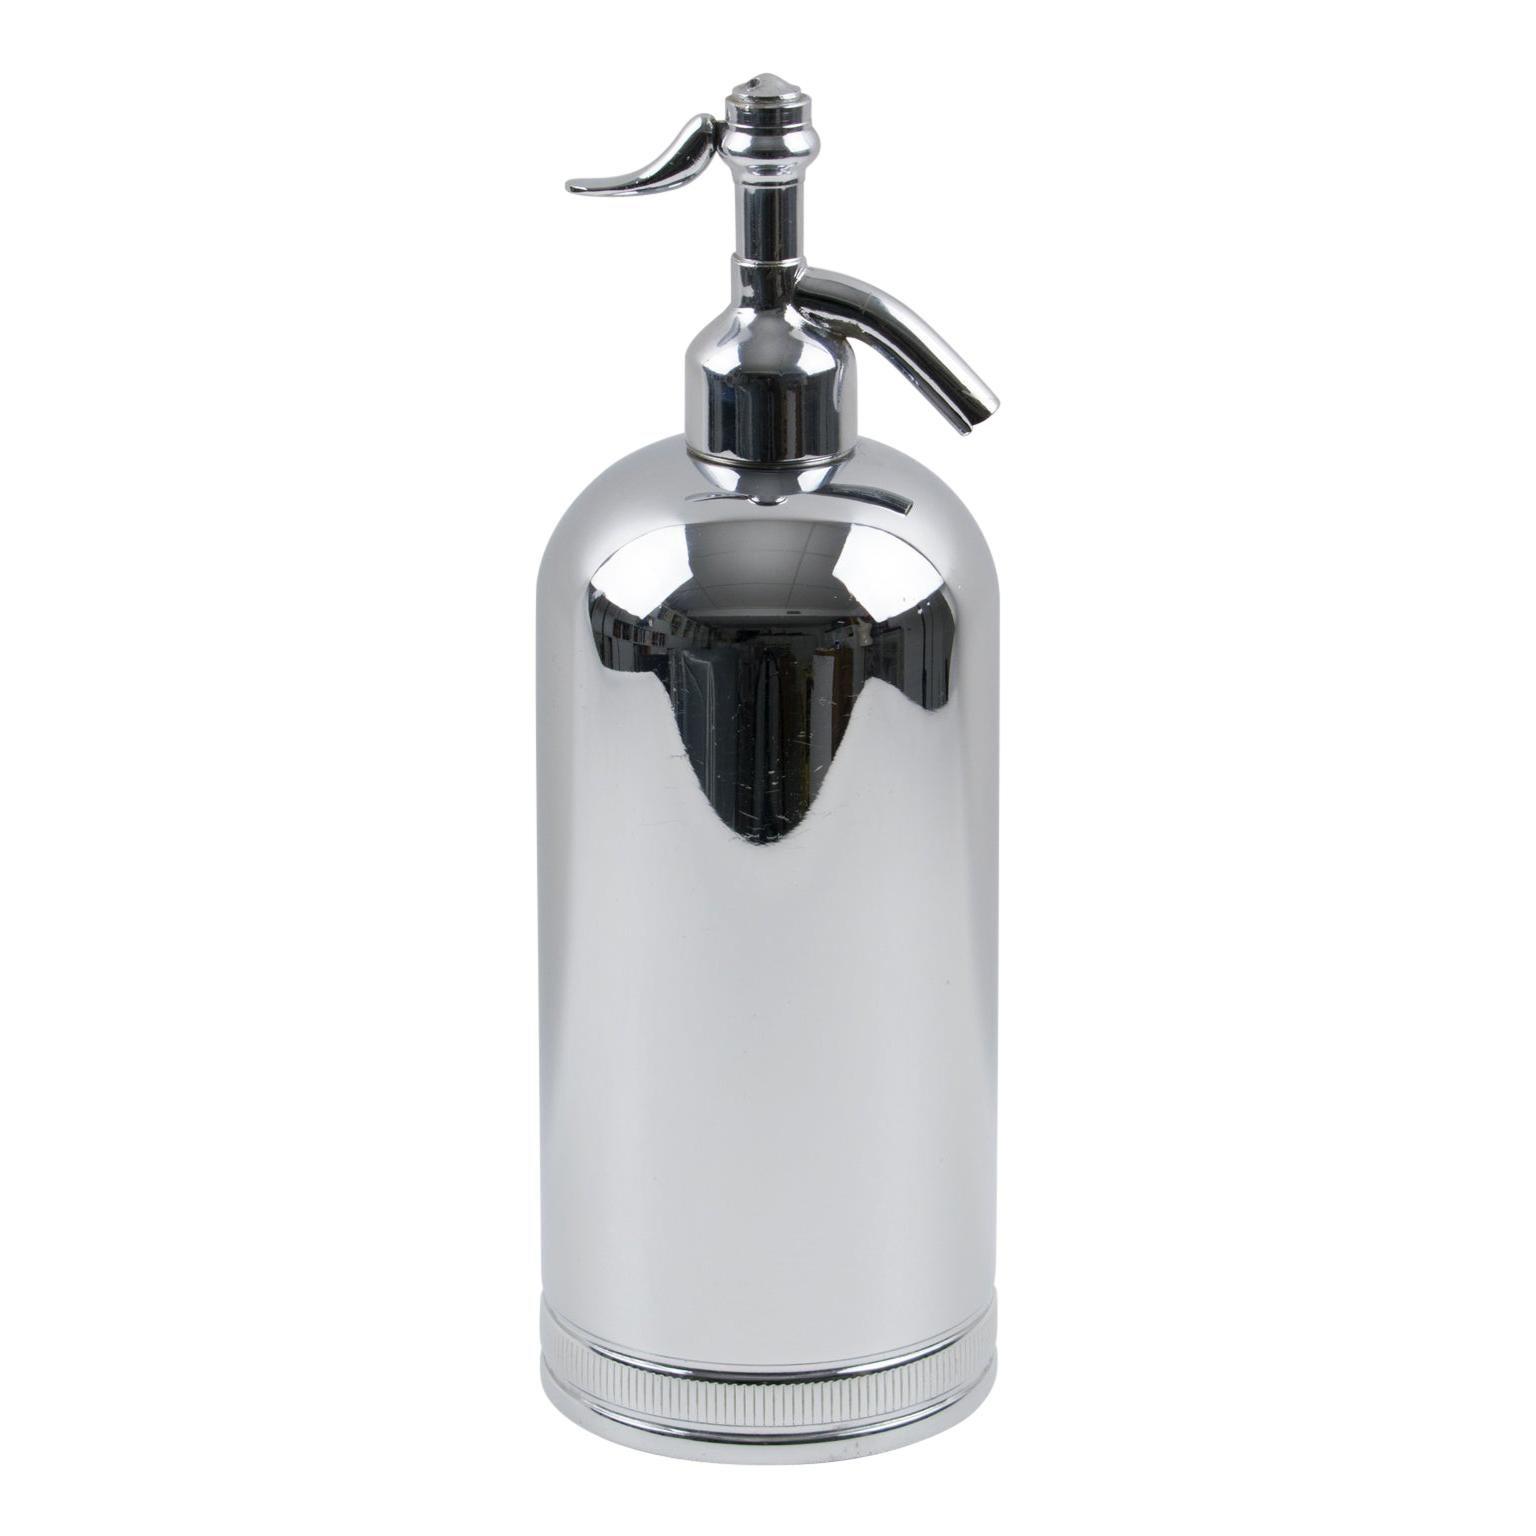 1950s French Soda Siphon Seltzer Water Bottle